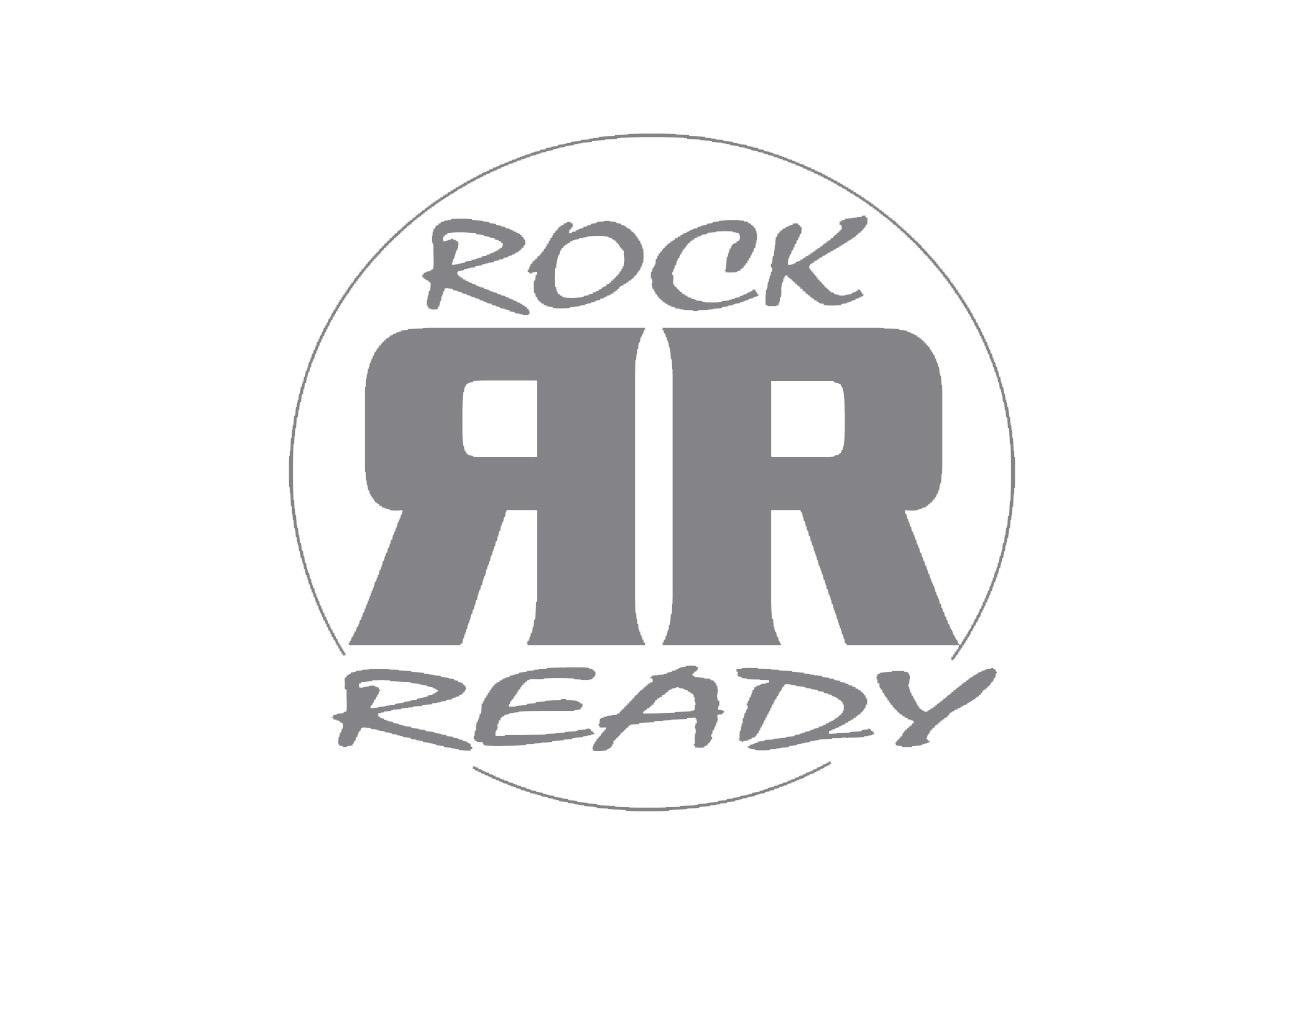 Rock Ready Cut Decal Size 4 5 Inch